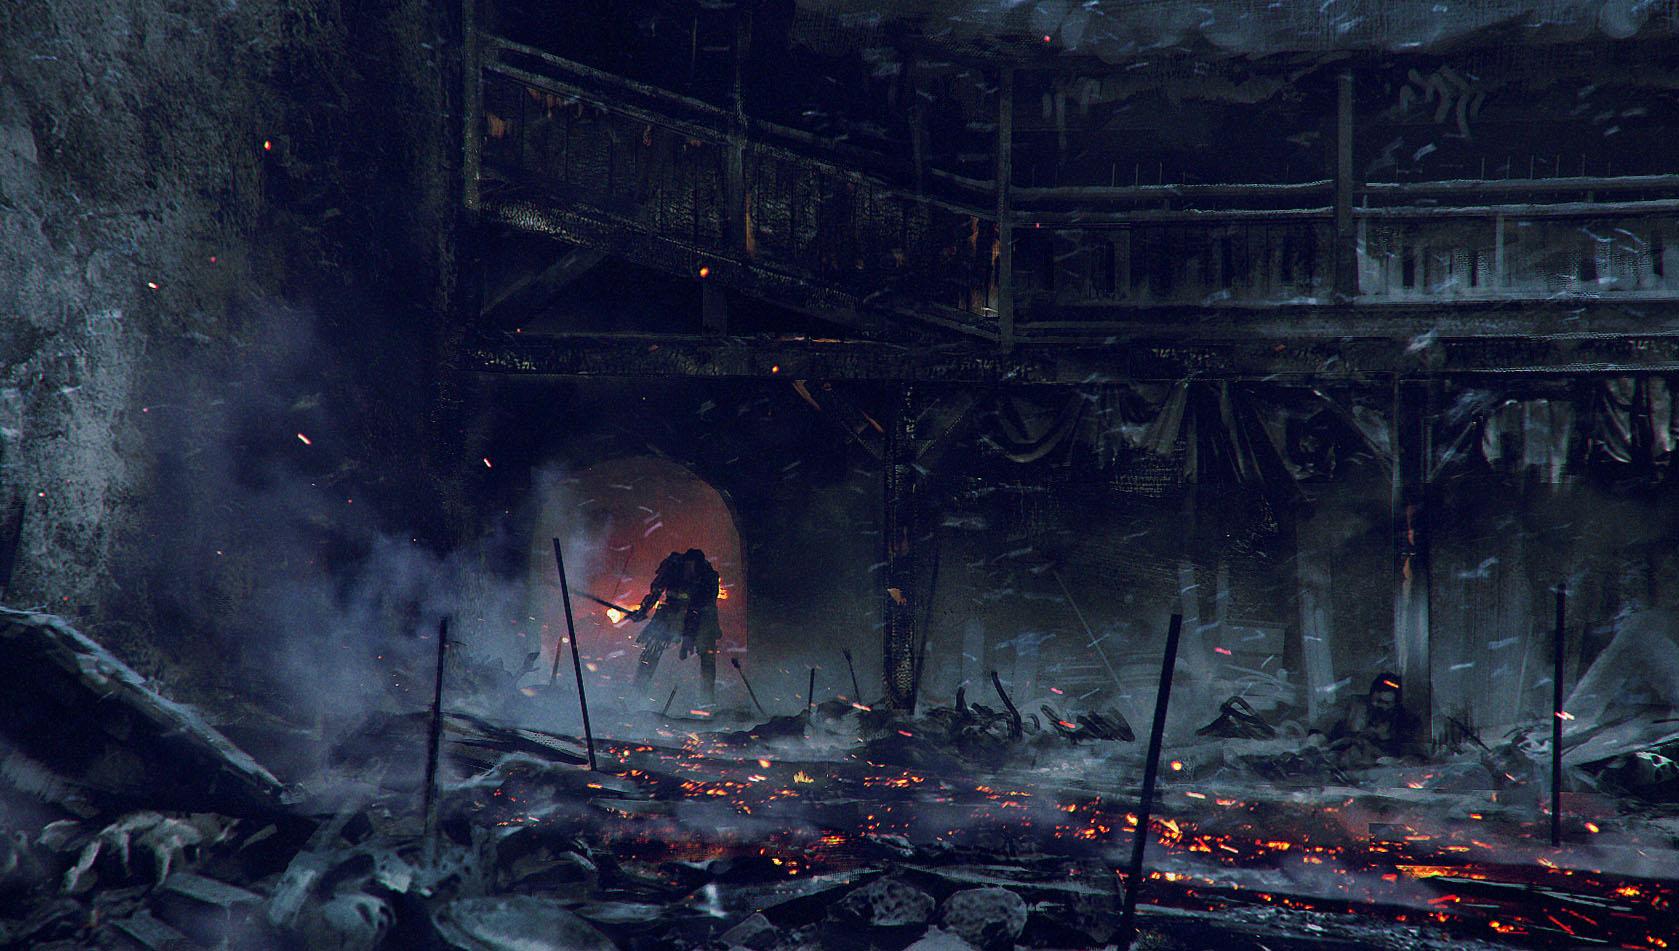 GOT8_Winterfell_burnt_Archway_skt_004b_ps copy.jpg